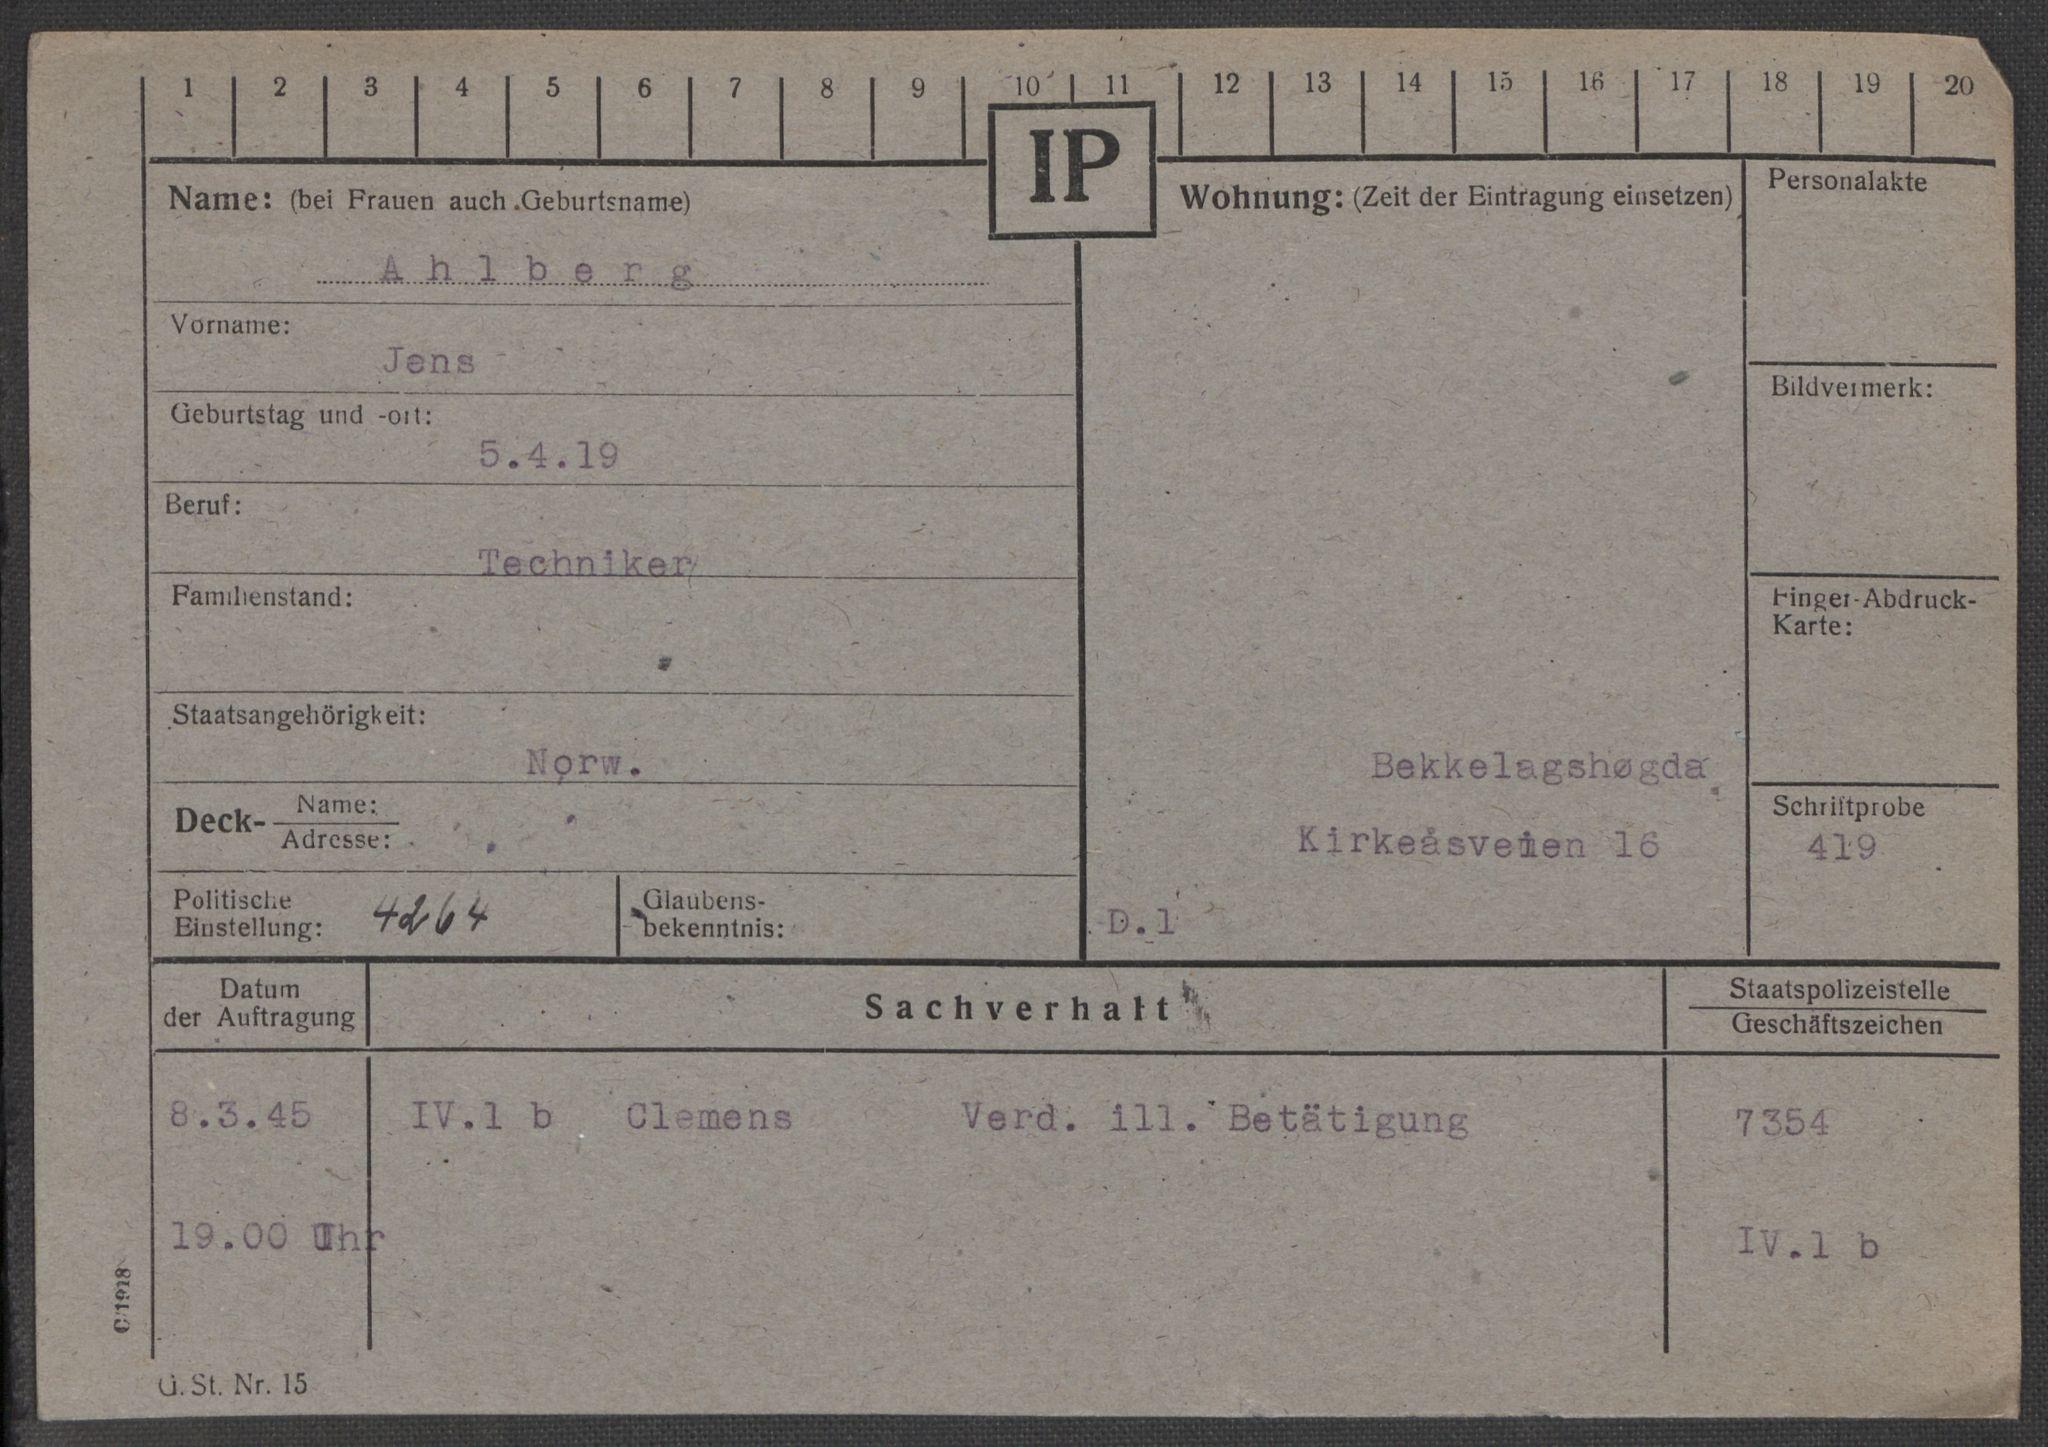 RA, Befehlshaber der Sicherheitspolizei und des SD, E/Ea/Eaa/L0001: Register over norske fanger i Møllergata 19: A-Bj, 1940-1945, s. 40